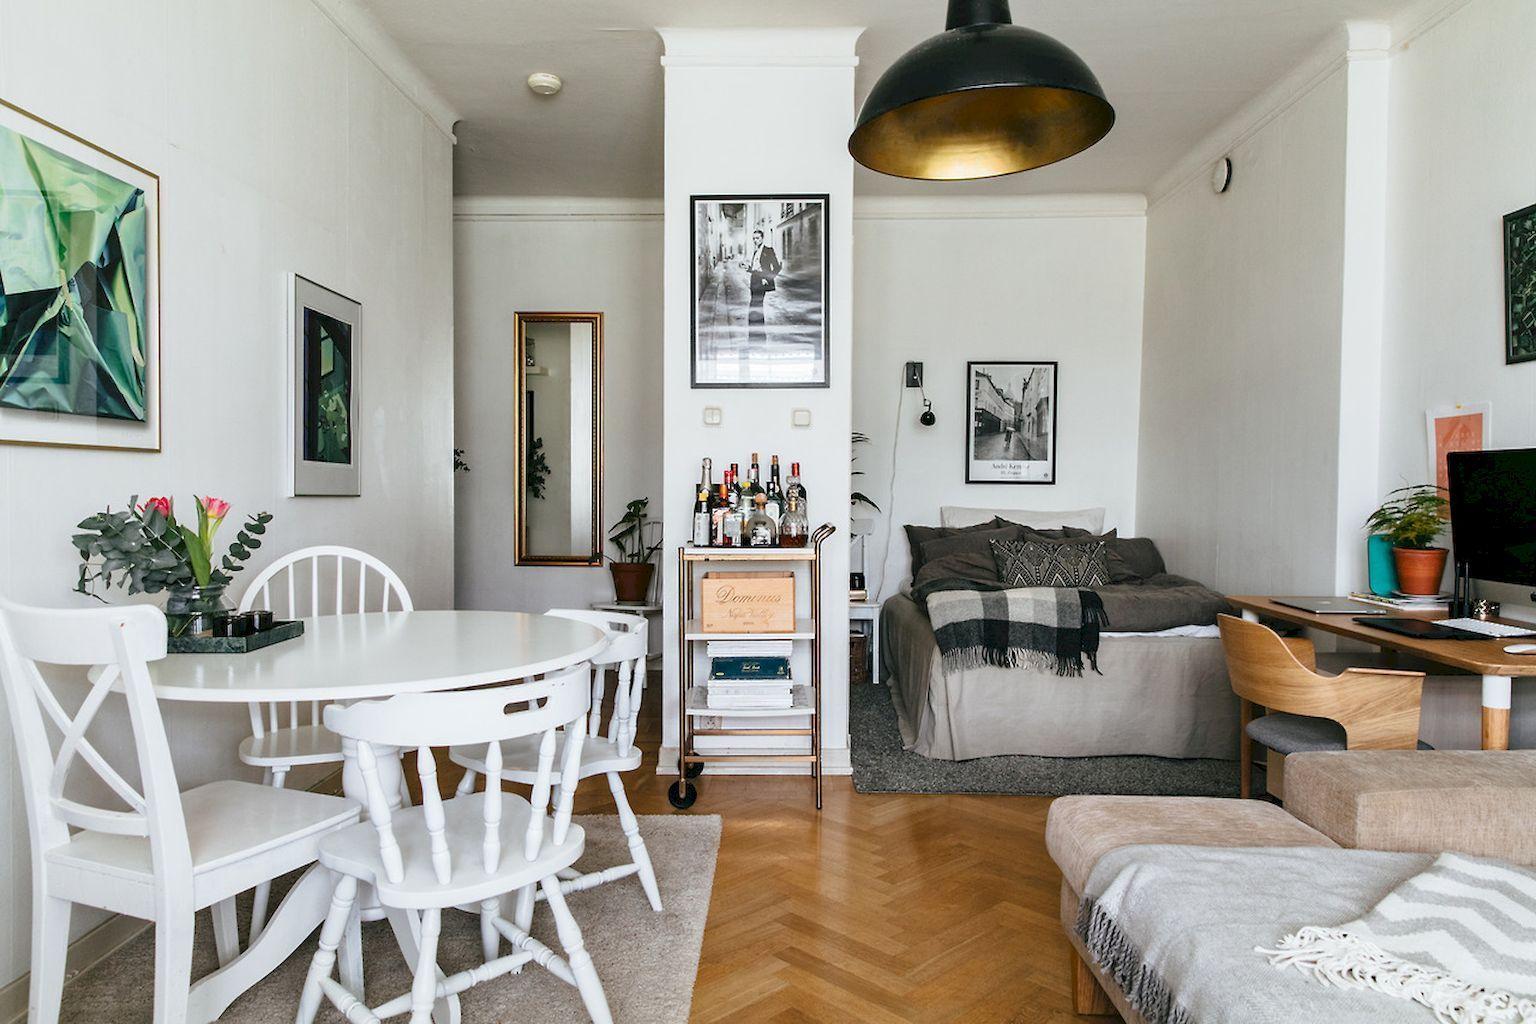 85 Stylish Apartment Studio Design And Decor Ideas Small